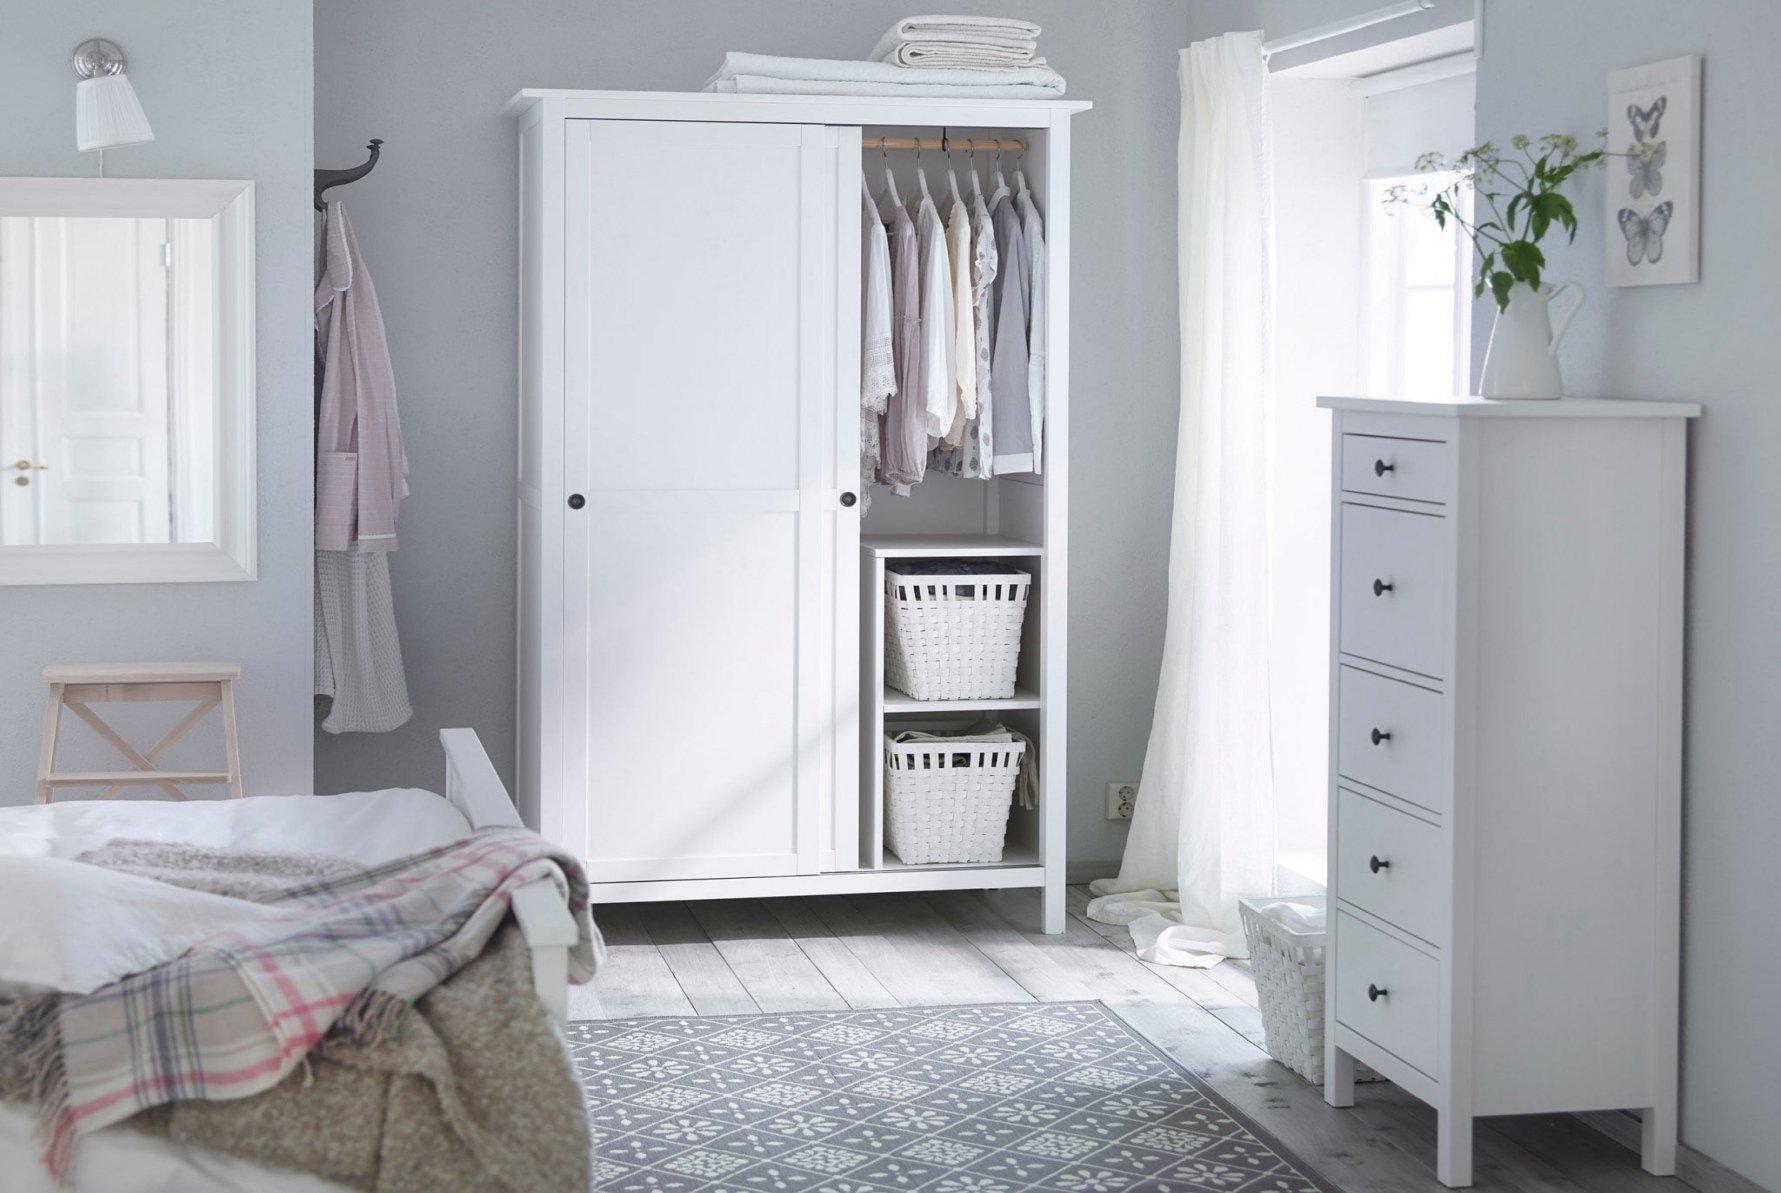 Ikea White Bedroom Furniture Beautiful Hemnes Bedroom Ideas White Ikea Bedroom Furniture Hemnes Bed